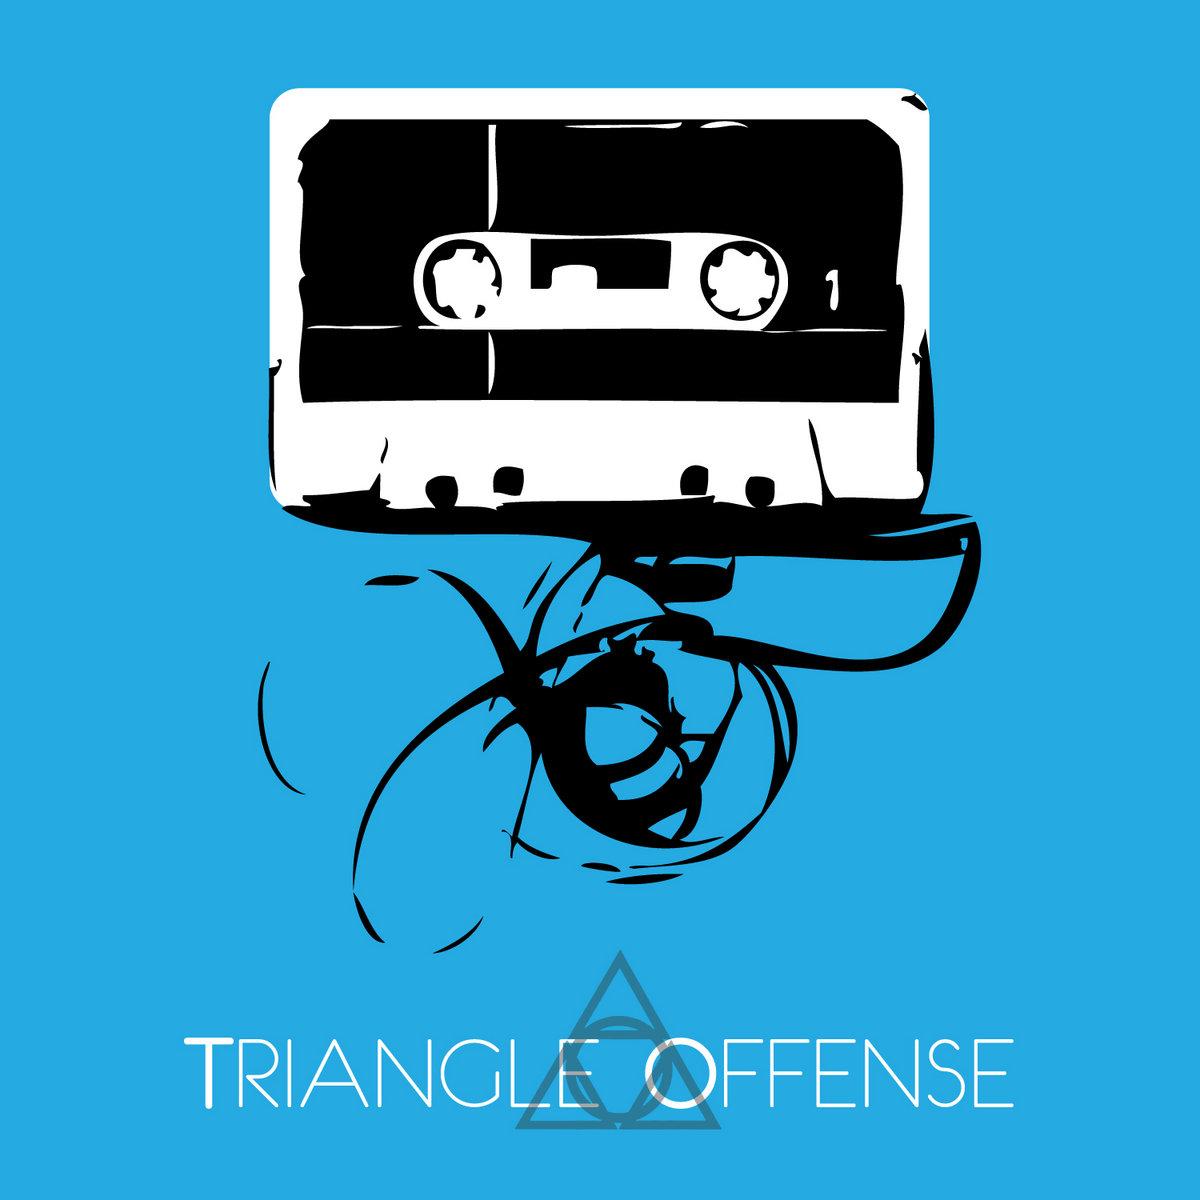 Frank Ocean Acura Integurl Lyrics